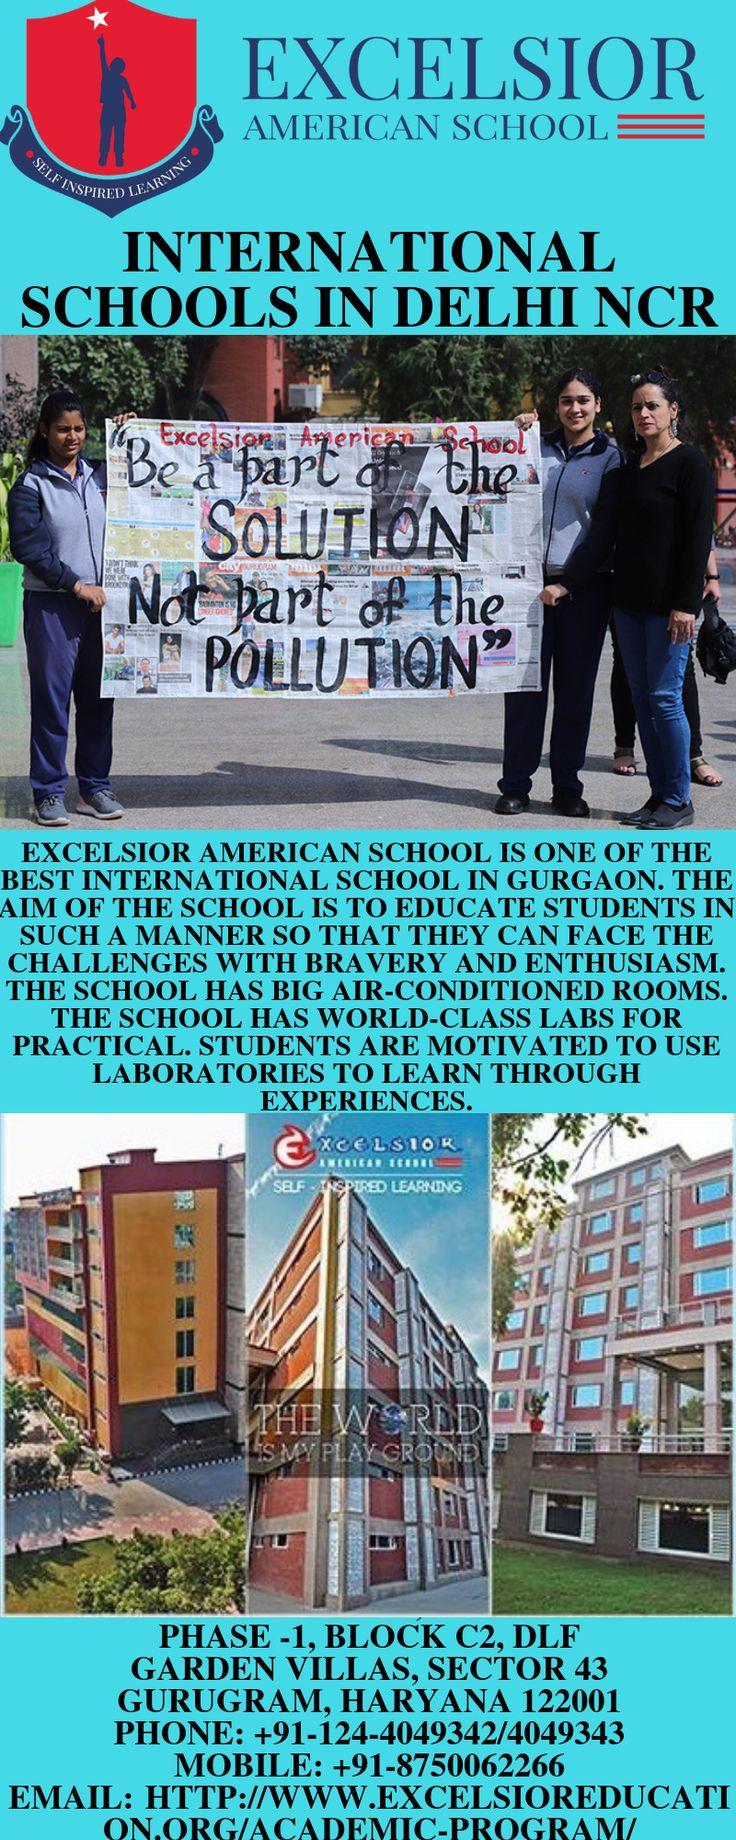 Ecoles internationales à Delhi ncr